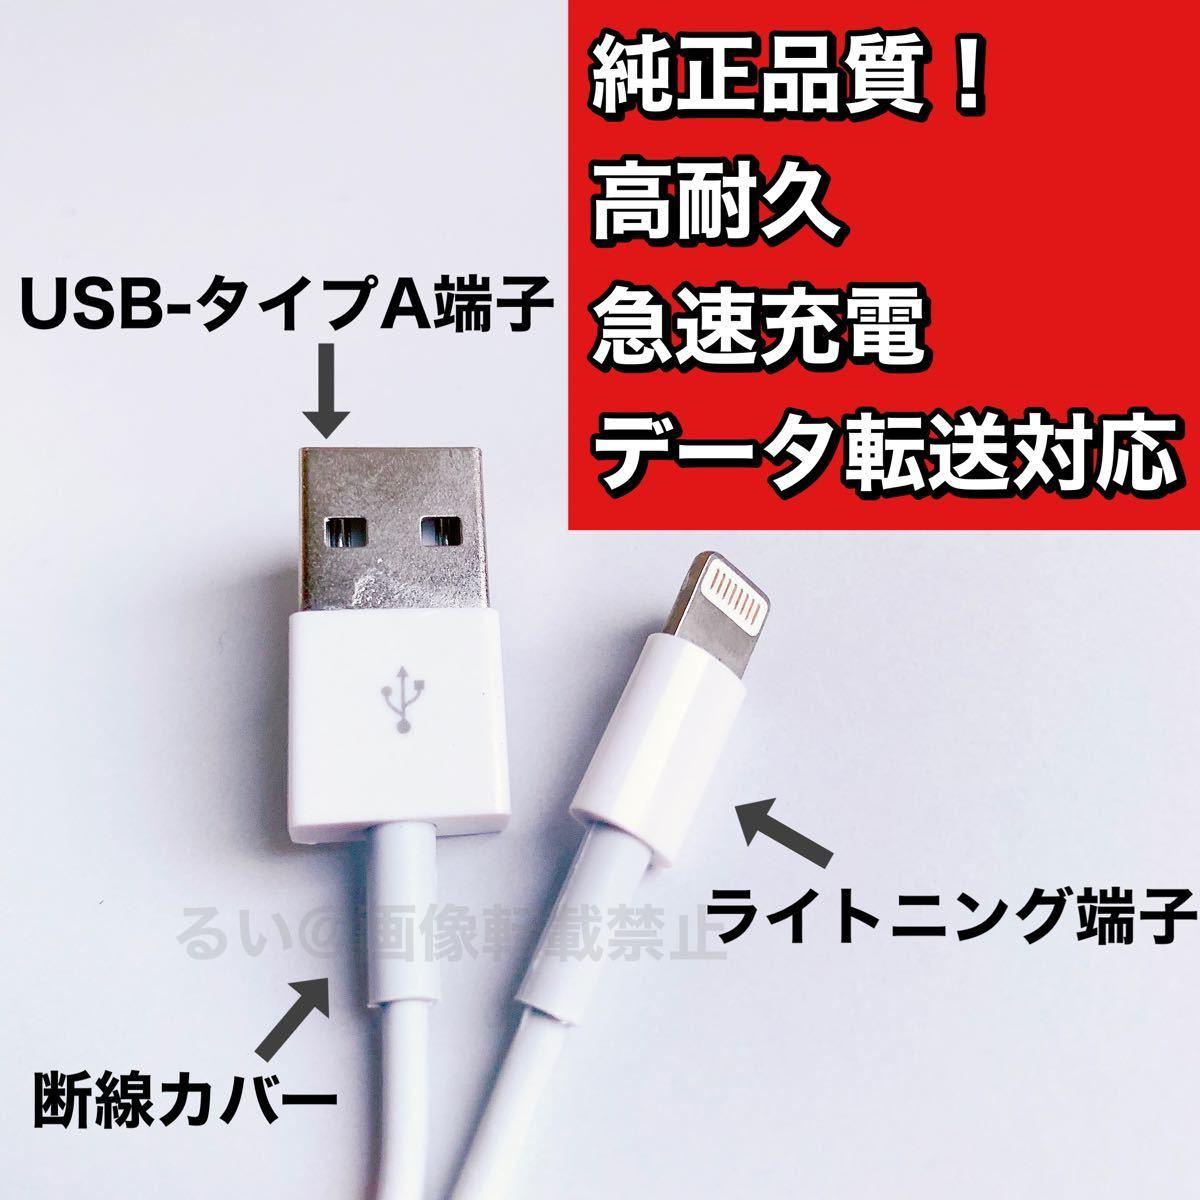 iPhone充電器 ライトニングケーブル iPhone7 iPhone X Apple アップル 2m8本